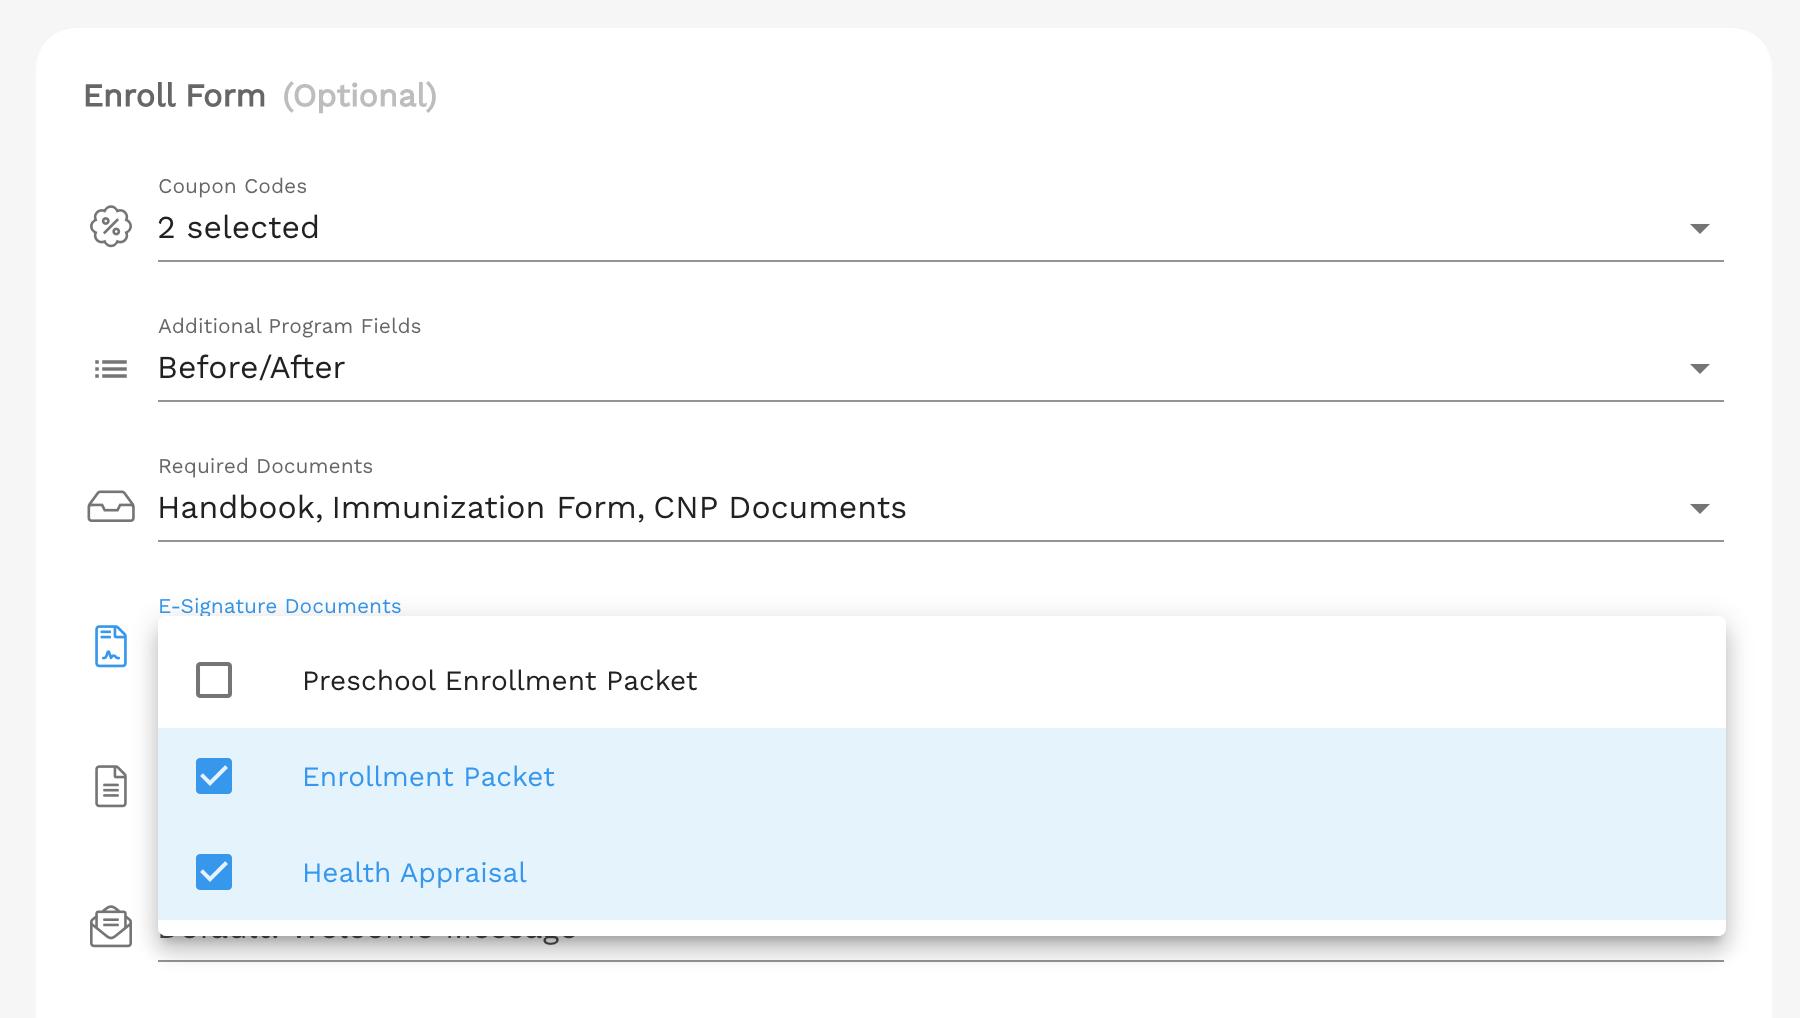 Attach E-Signature documents to Programs in Enrollsy